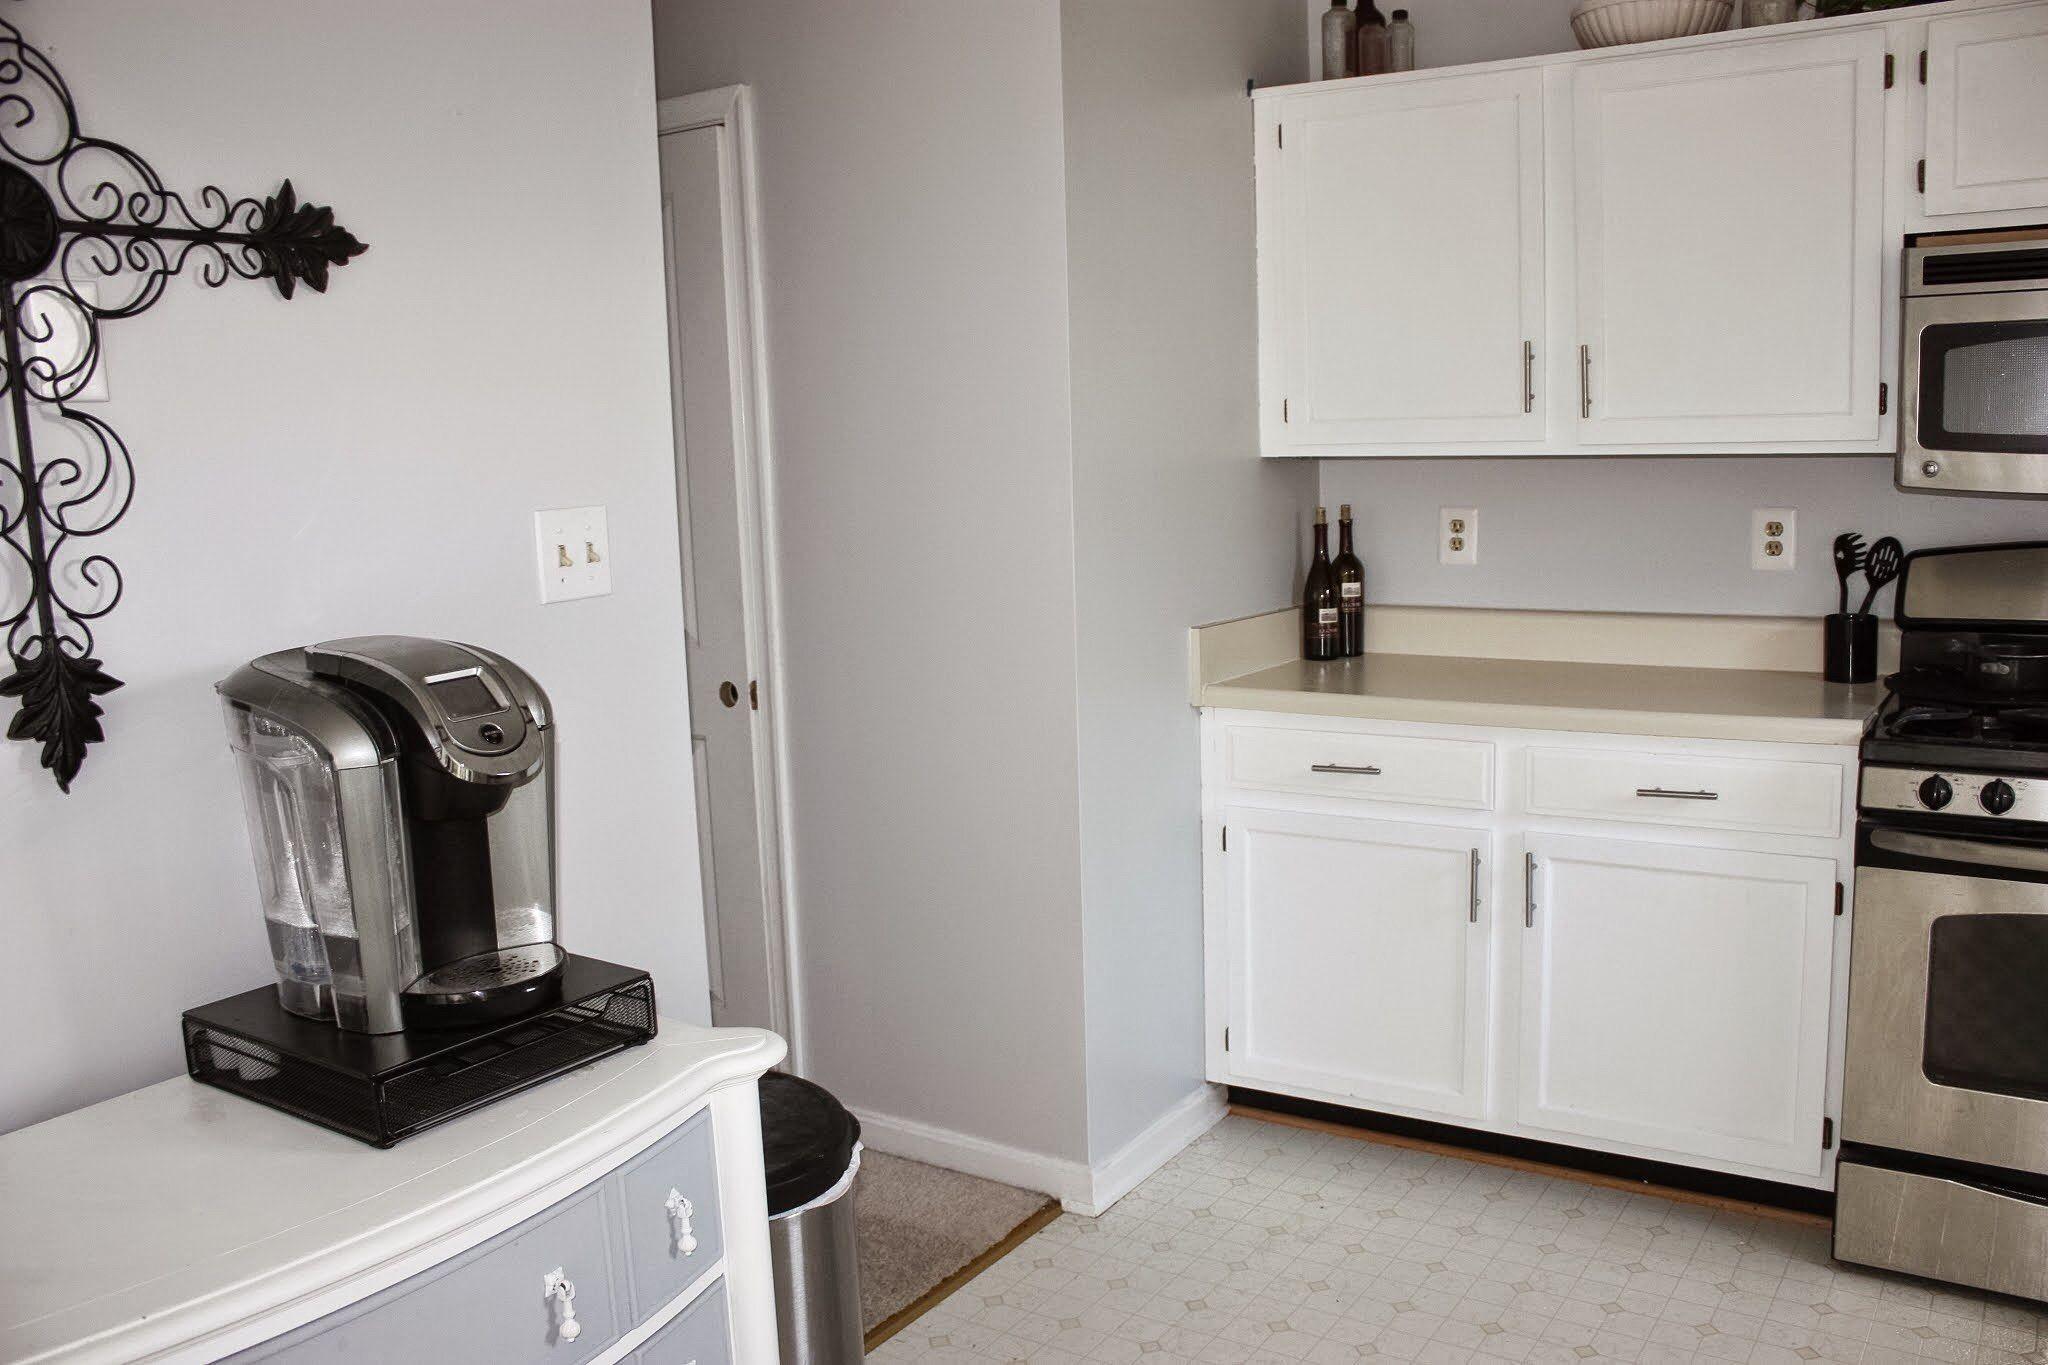 Behr Kitchen Cabinet Paint kitchen cabinets painted behr ultra pure white | kitchens